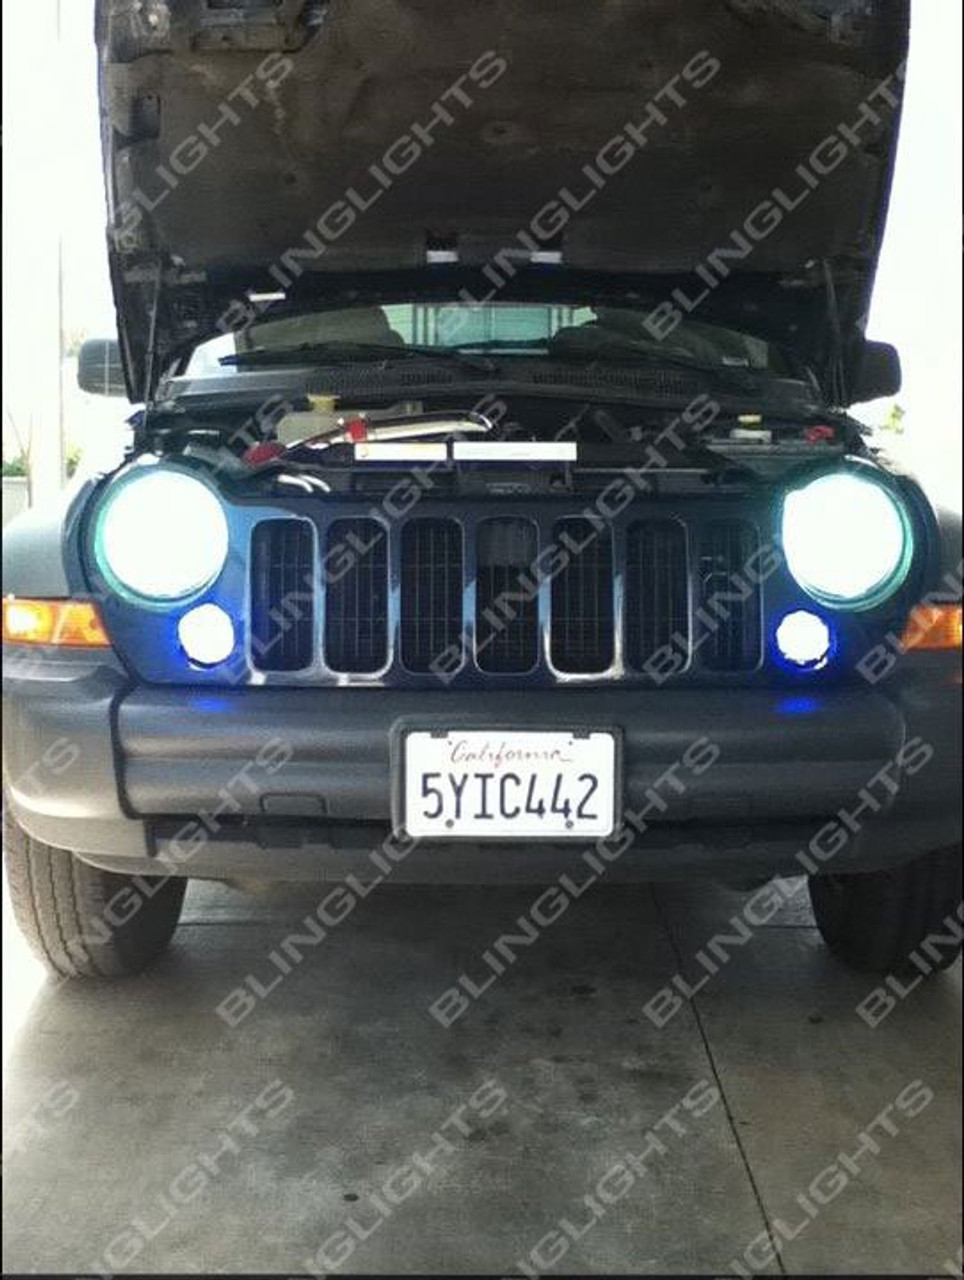 2004 Jeep Liberty Headlights : liberty, headlights, Jeep:, Liberty, Headlights